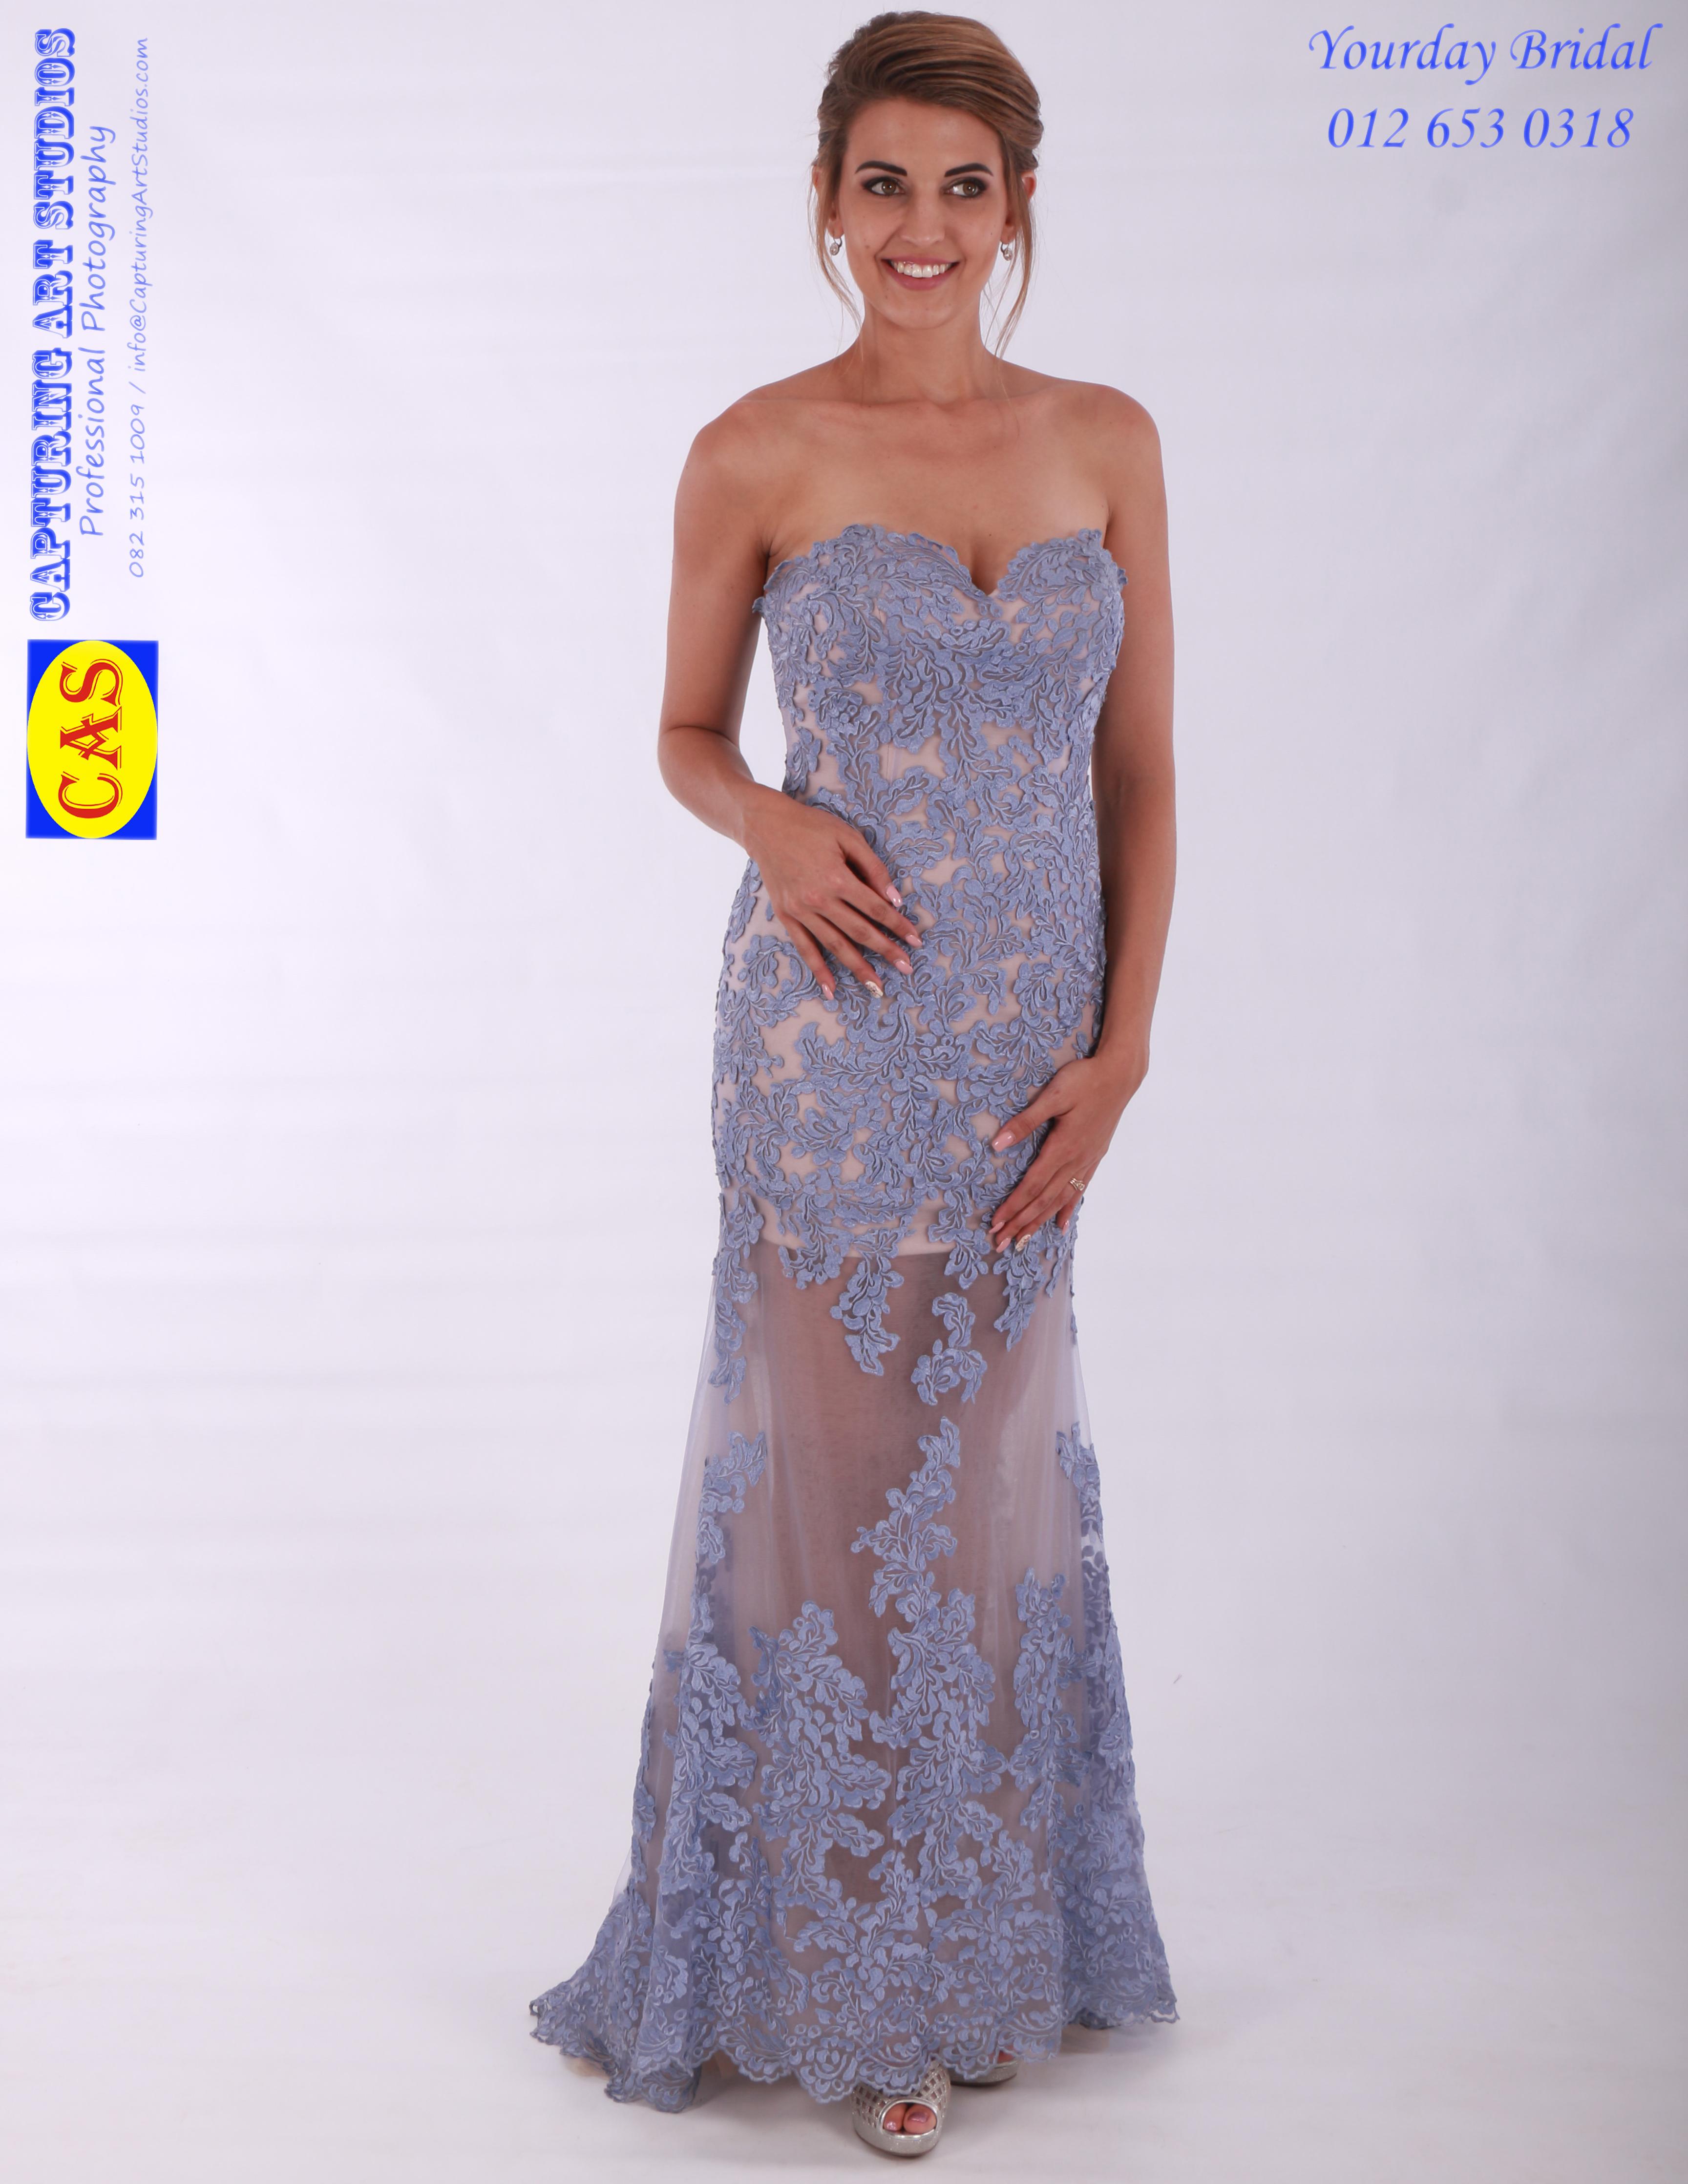 c40c30265b Cheap Formal Dresses In Pretoria - Data Dynamic AG